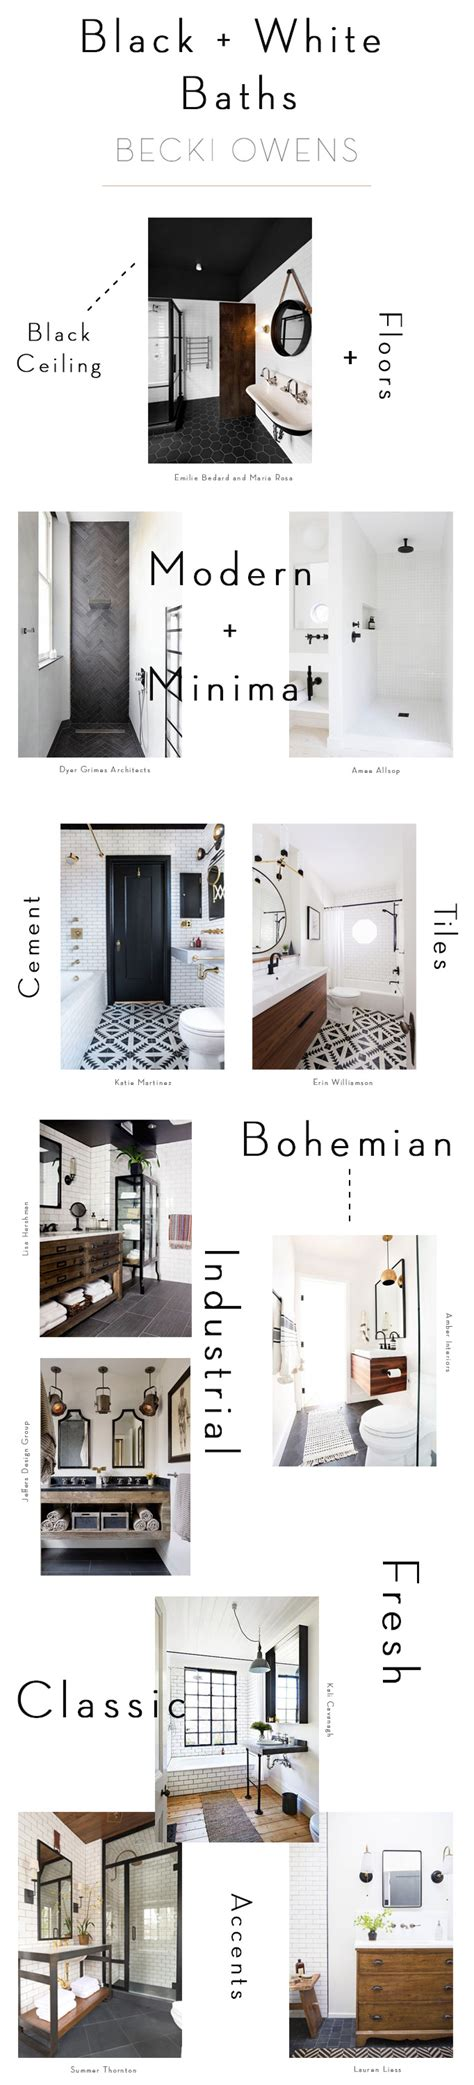 bathroom black and white black and white bathrooms becki owens